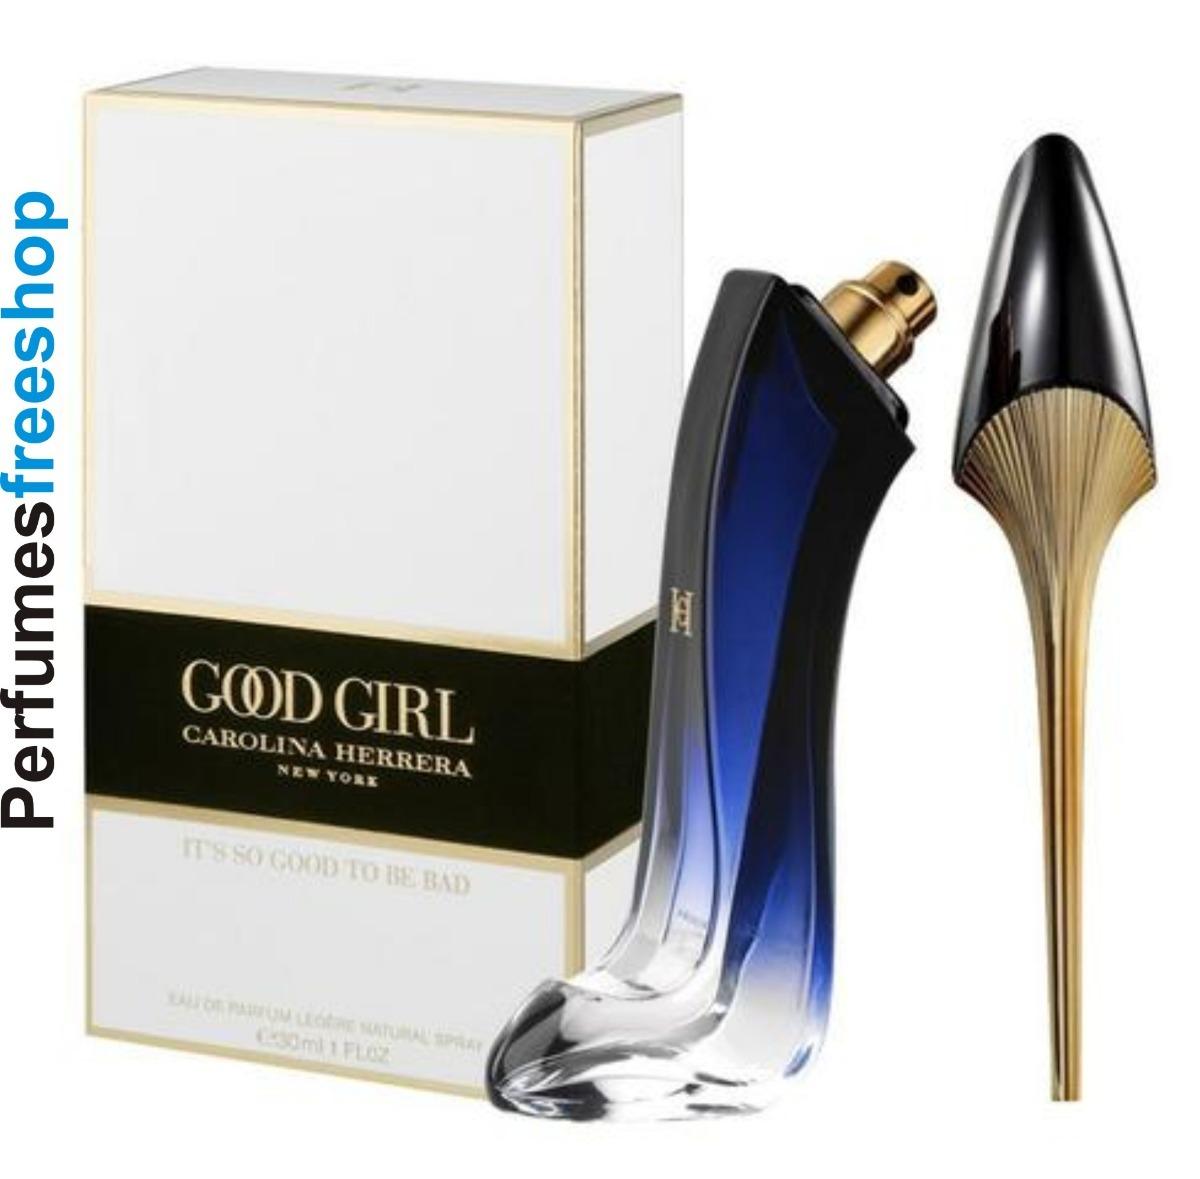 e7aae213ce good girl legere carolina herrera perfume 30ml envio gratis! Cargando zoom.